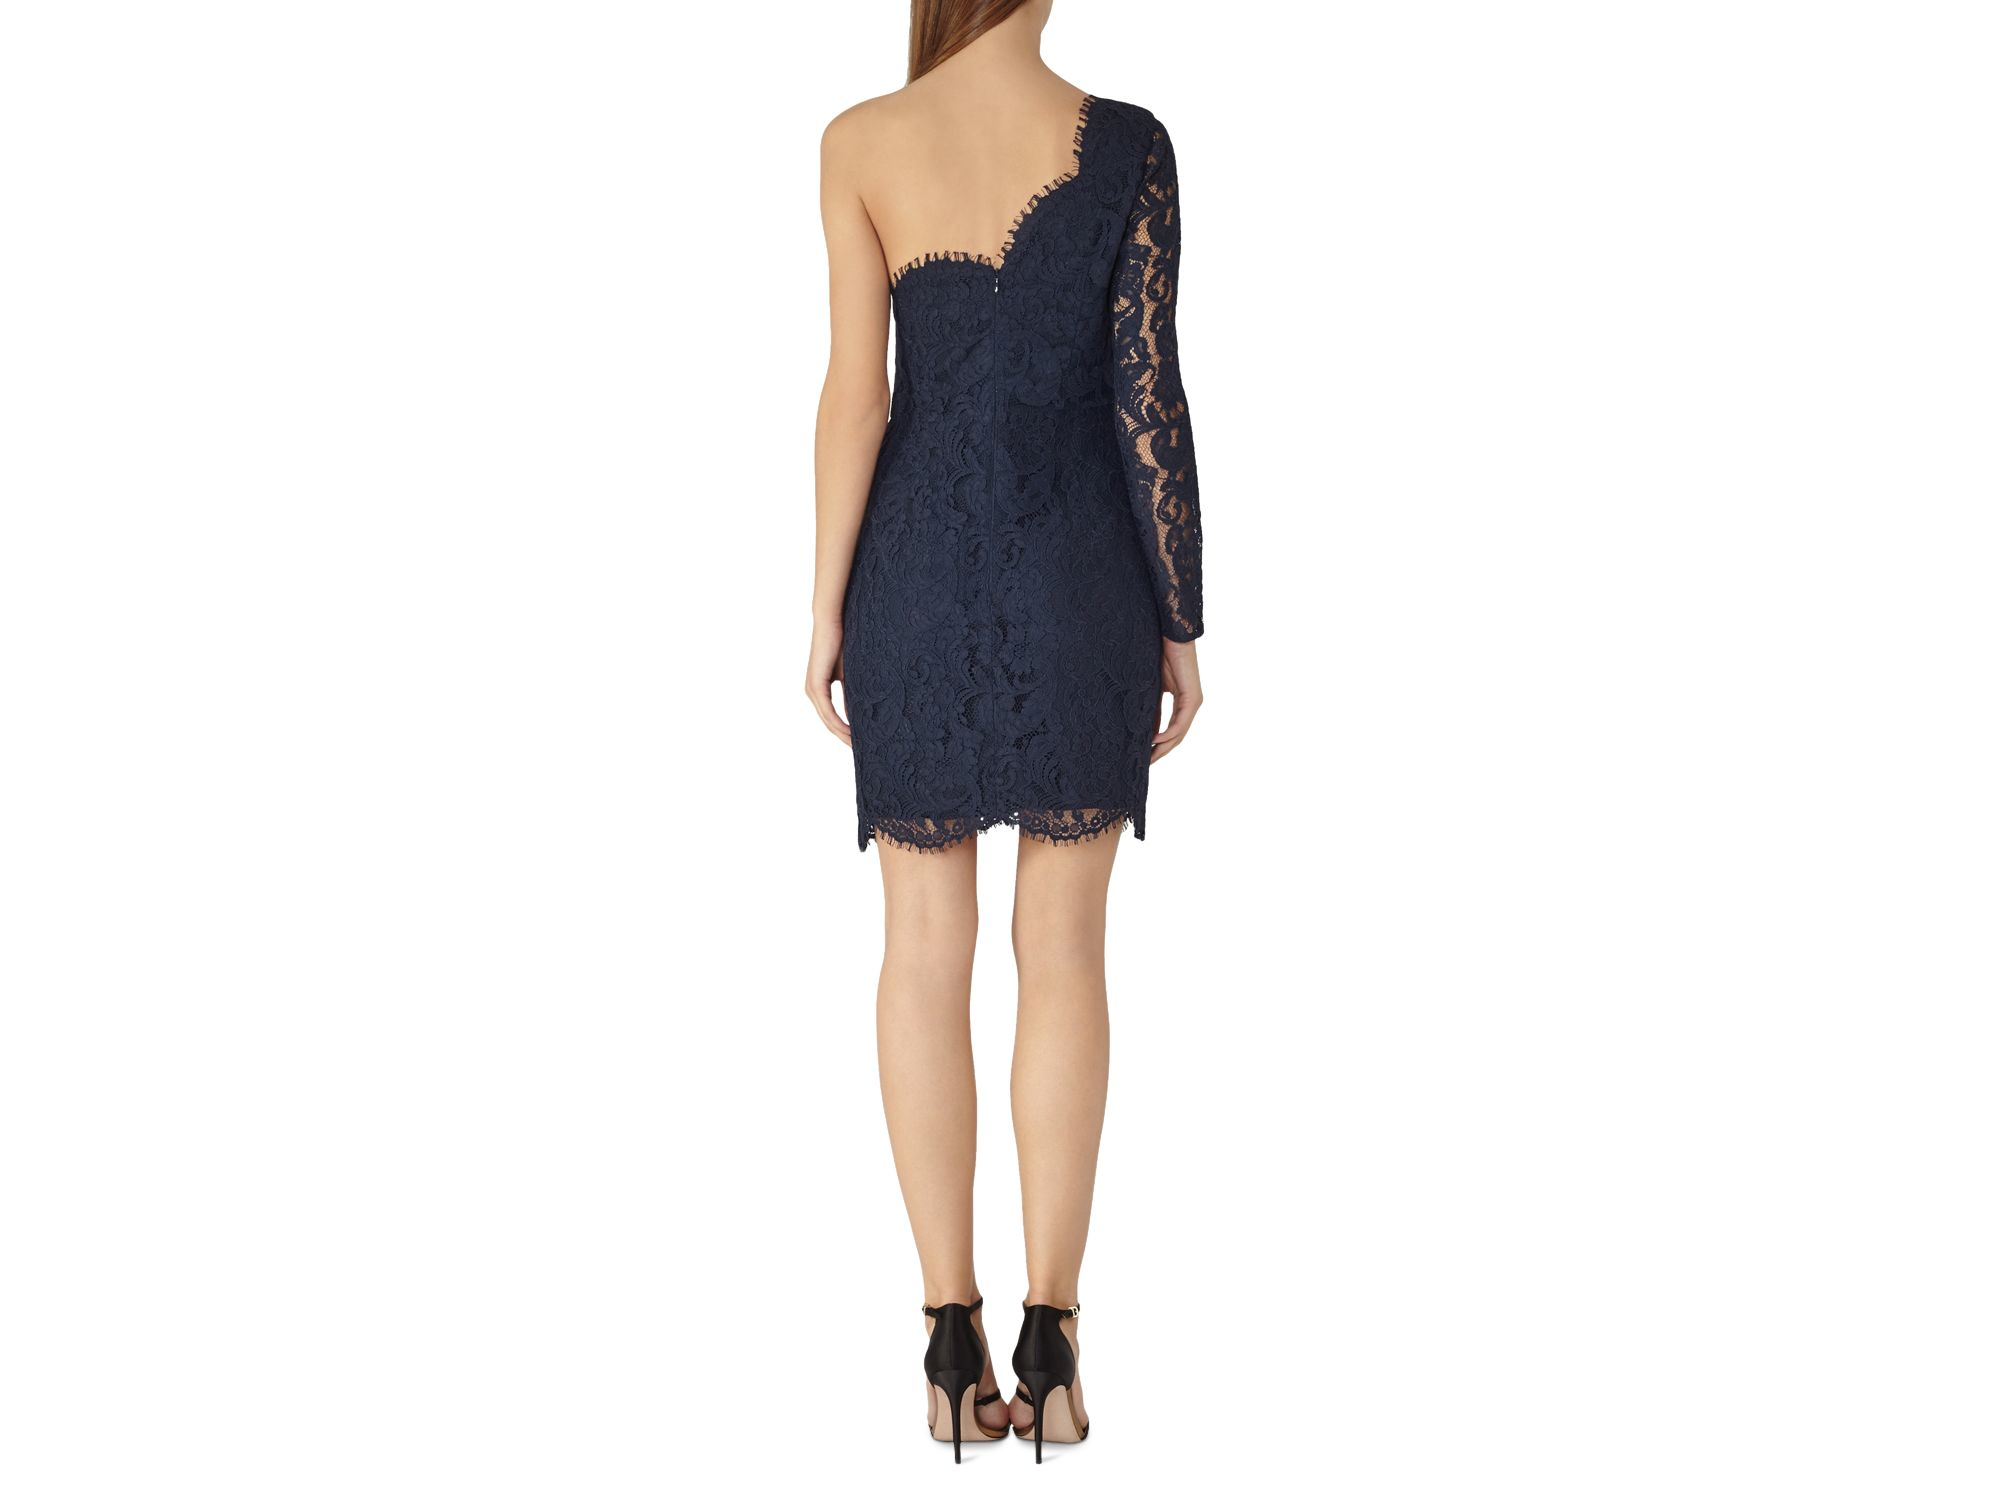 Reiss london navy lace dress